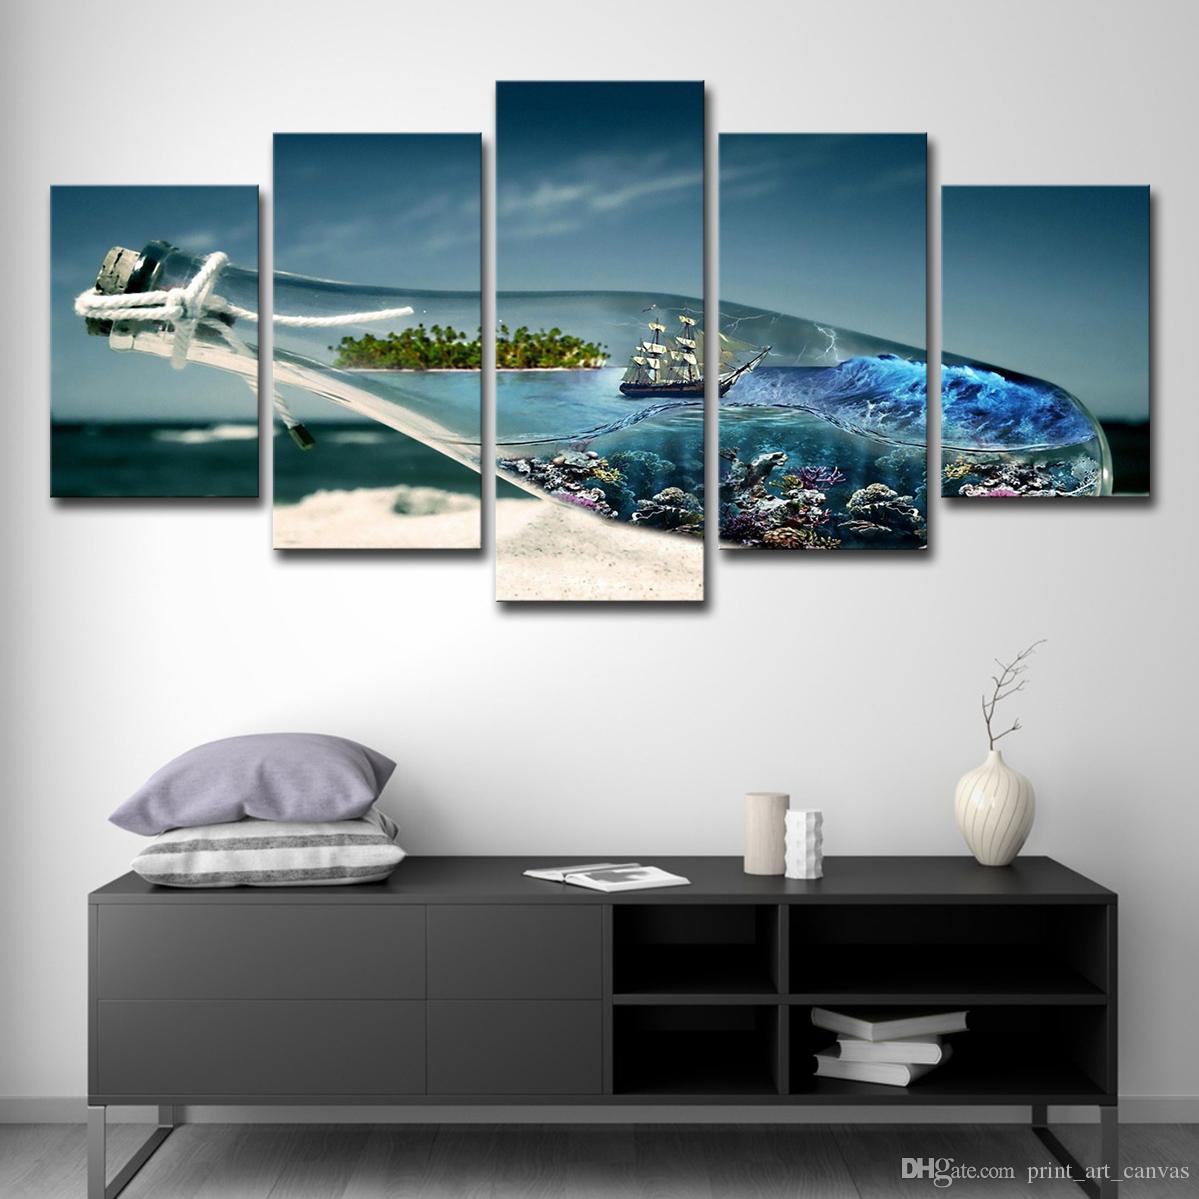 Home Decor Quadri su tela Wall Art 5 pezzi Ocean World in un Wishing Bottle Paintings HD Poster Beach Sailboat Poster